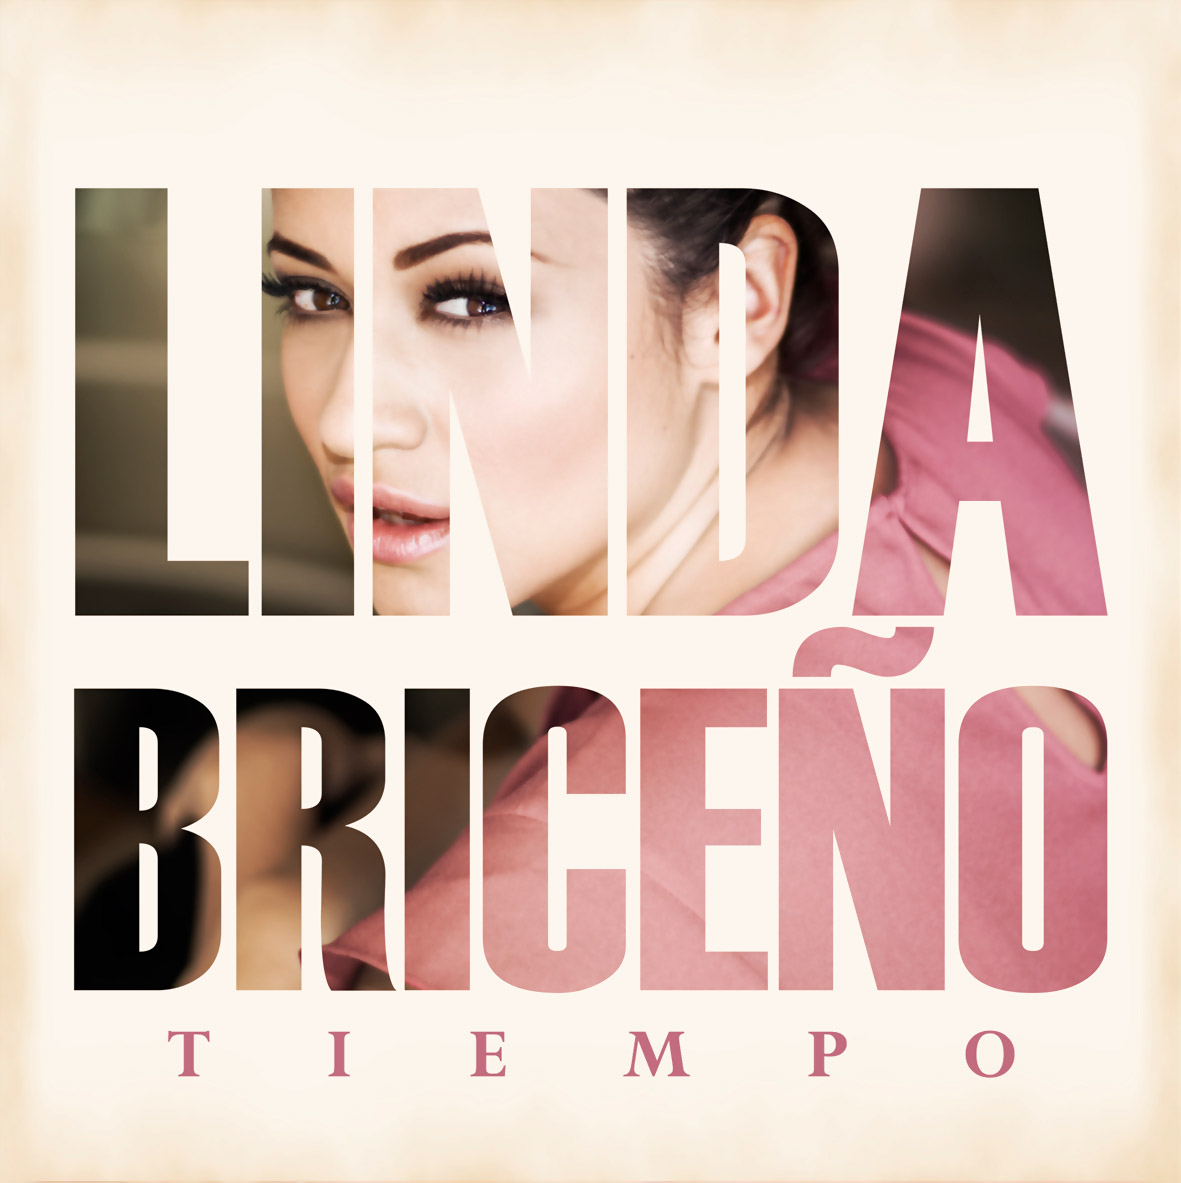 Linda Briceño